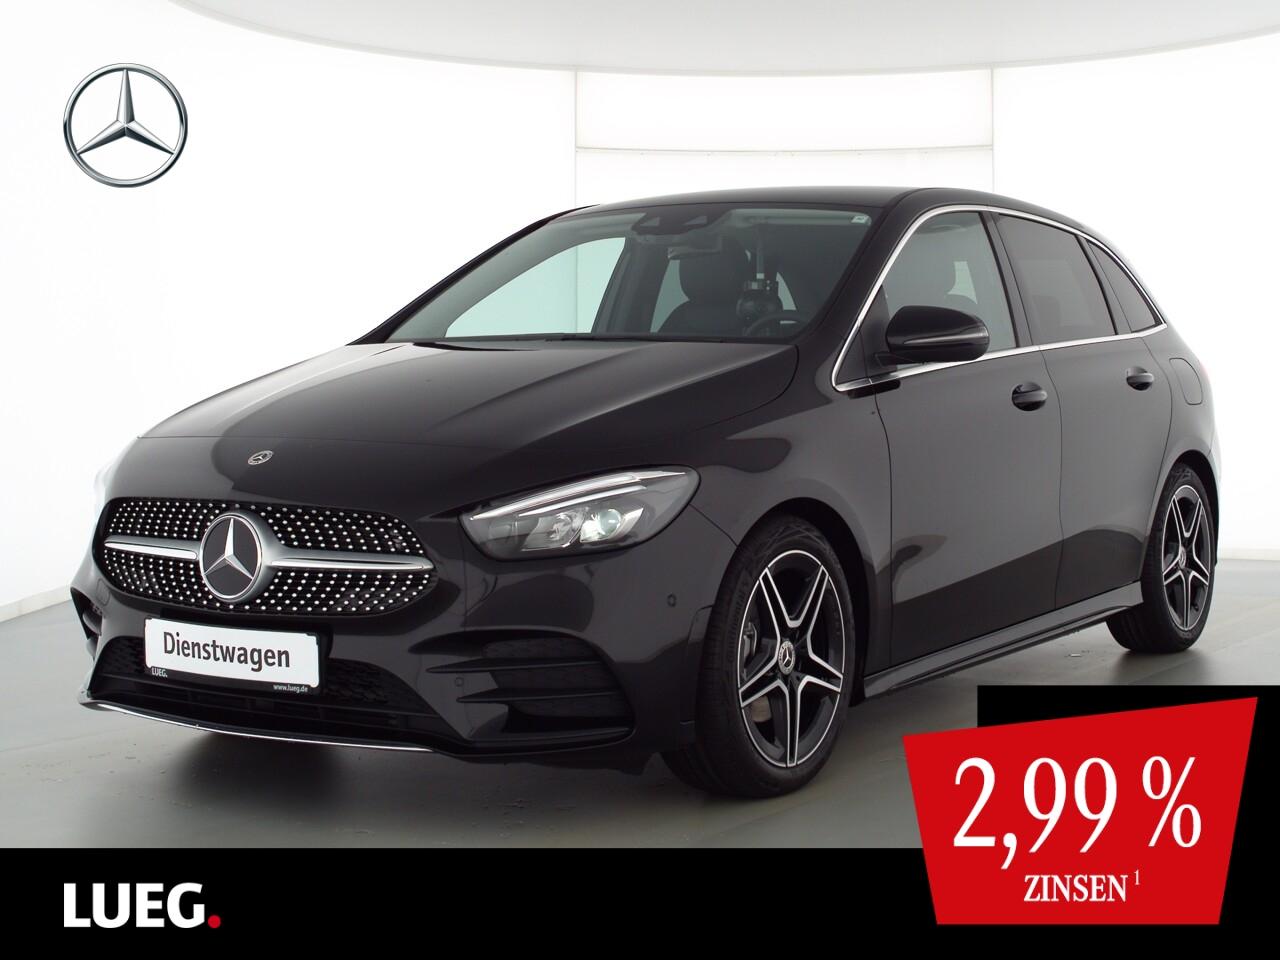 Mercedes-Benz B 200 4M AMG+TOTW+KAMERA+LED+DKL.GLAS+MBUX-HIGH, Jahr 2021, Benzin